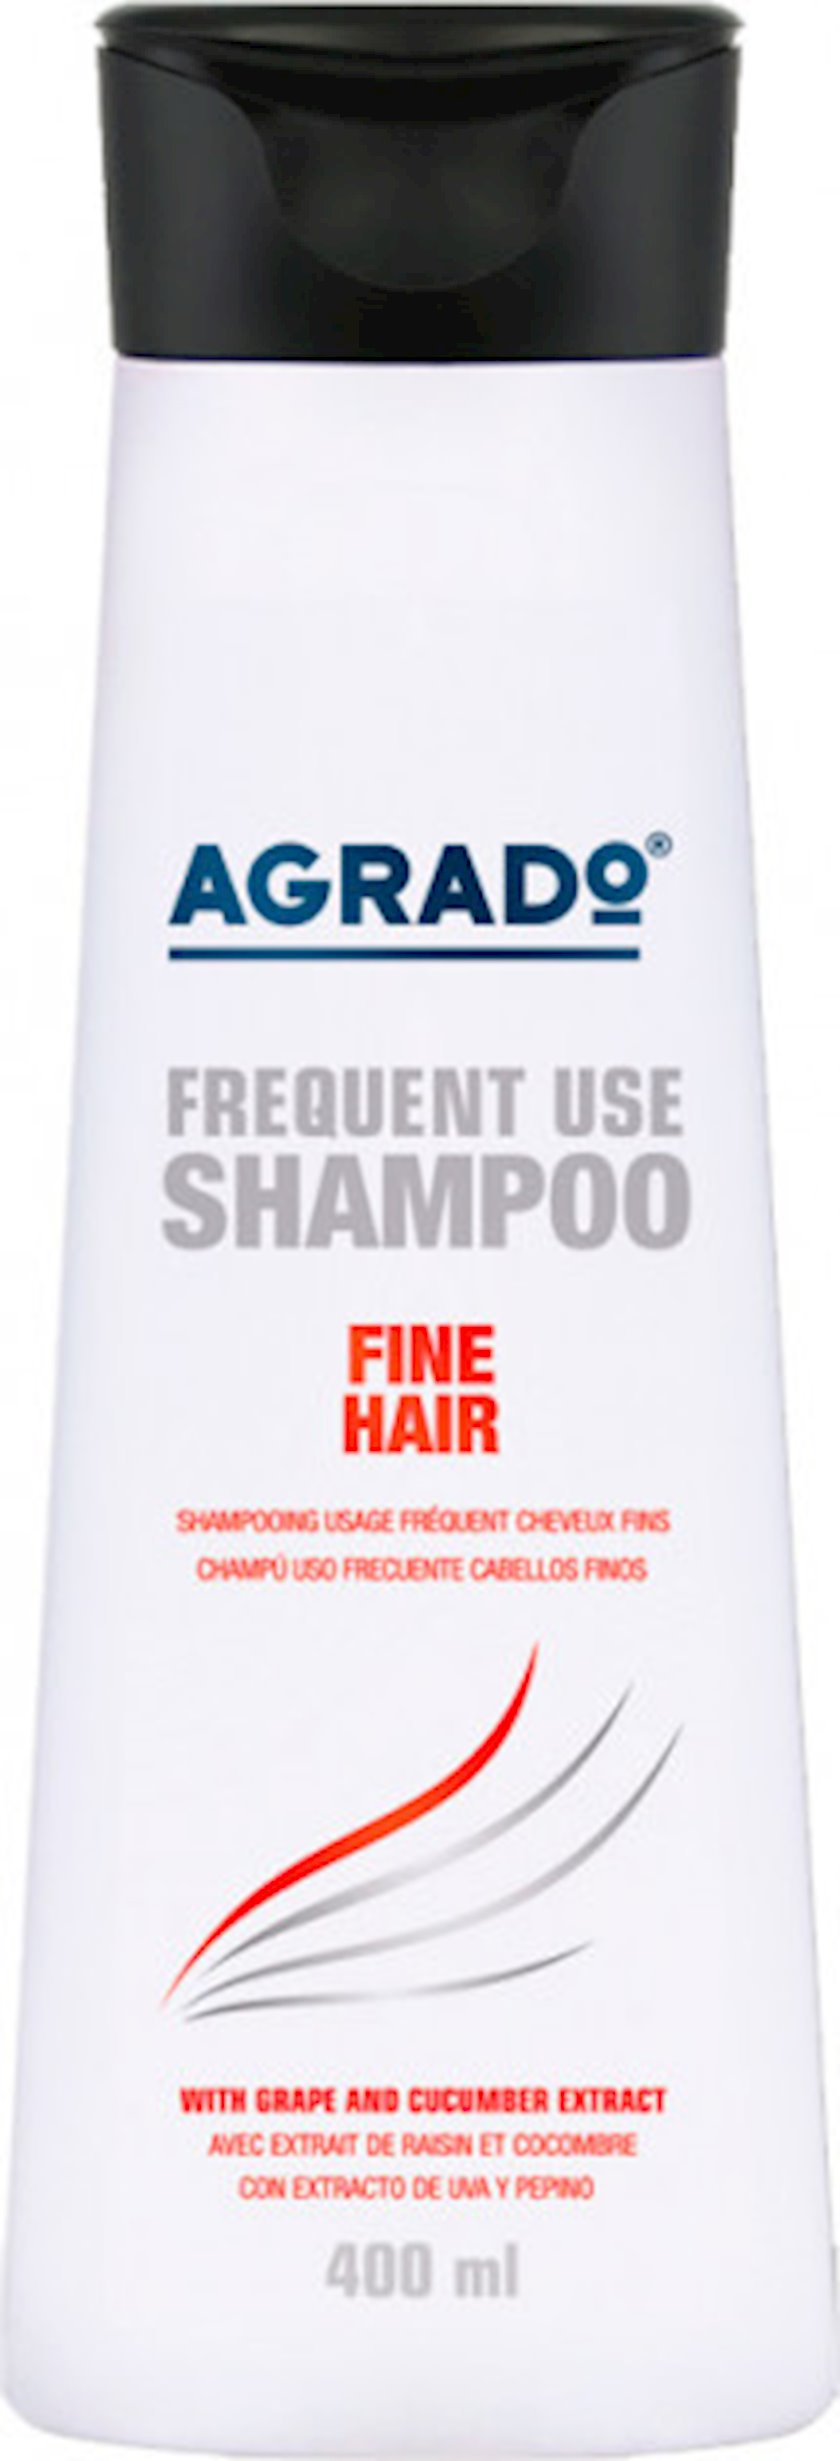 Şampun Agrado Fine Hair, 400 ml